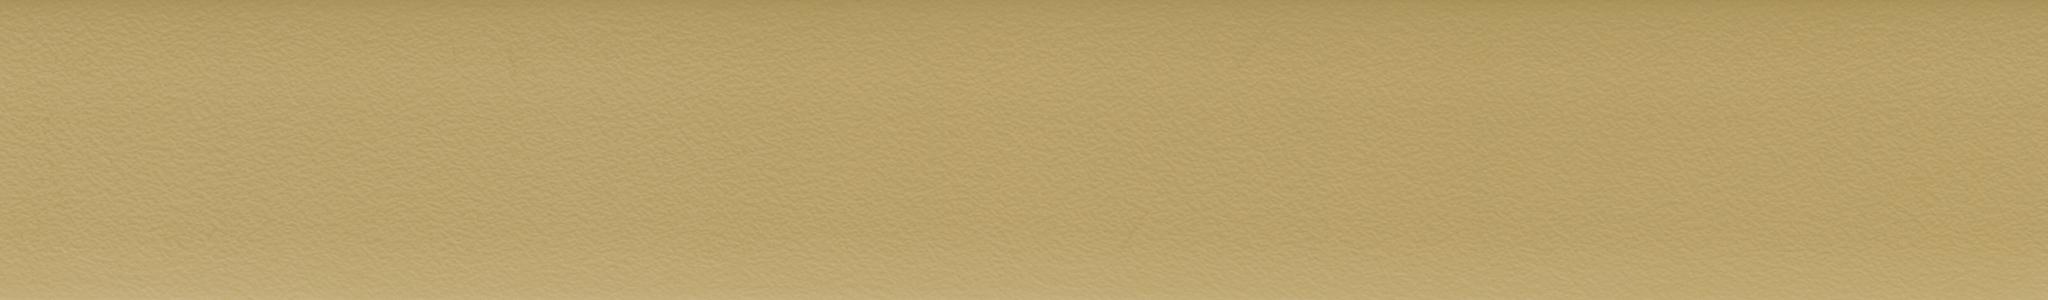 HU 16619 Chant ABS Olive Perle XG